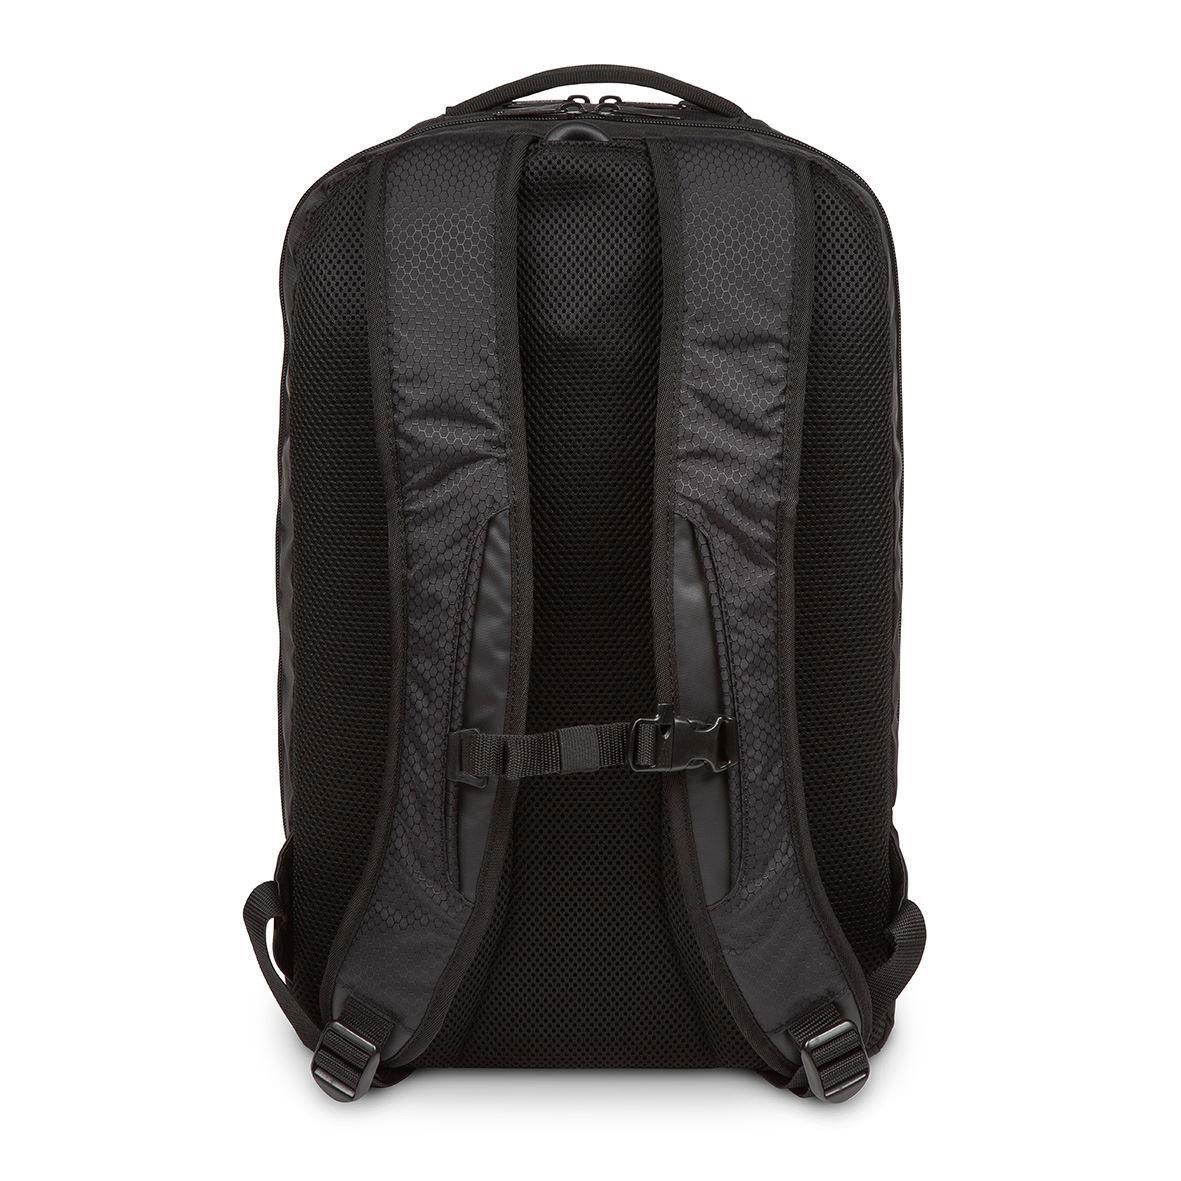 "Stamina 15.6"" Laptop Backpack Targus - Sac et sacoche - 6"